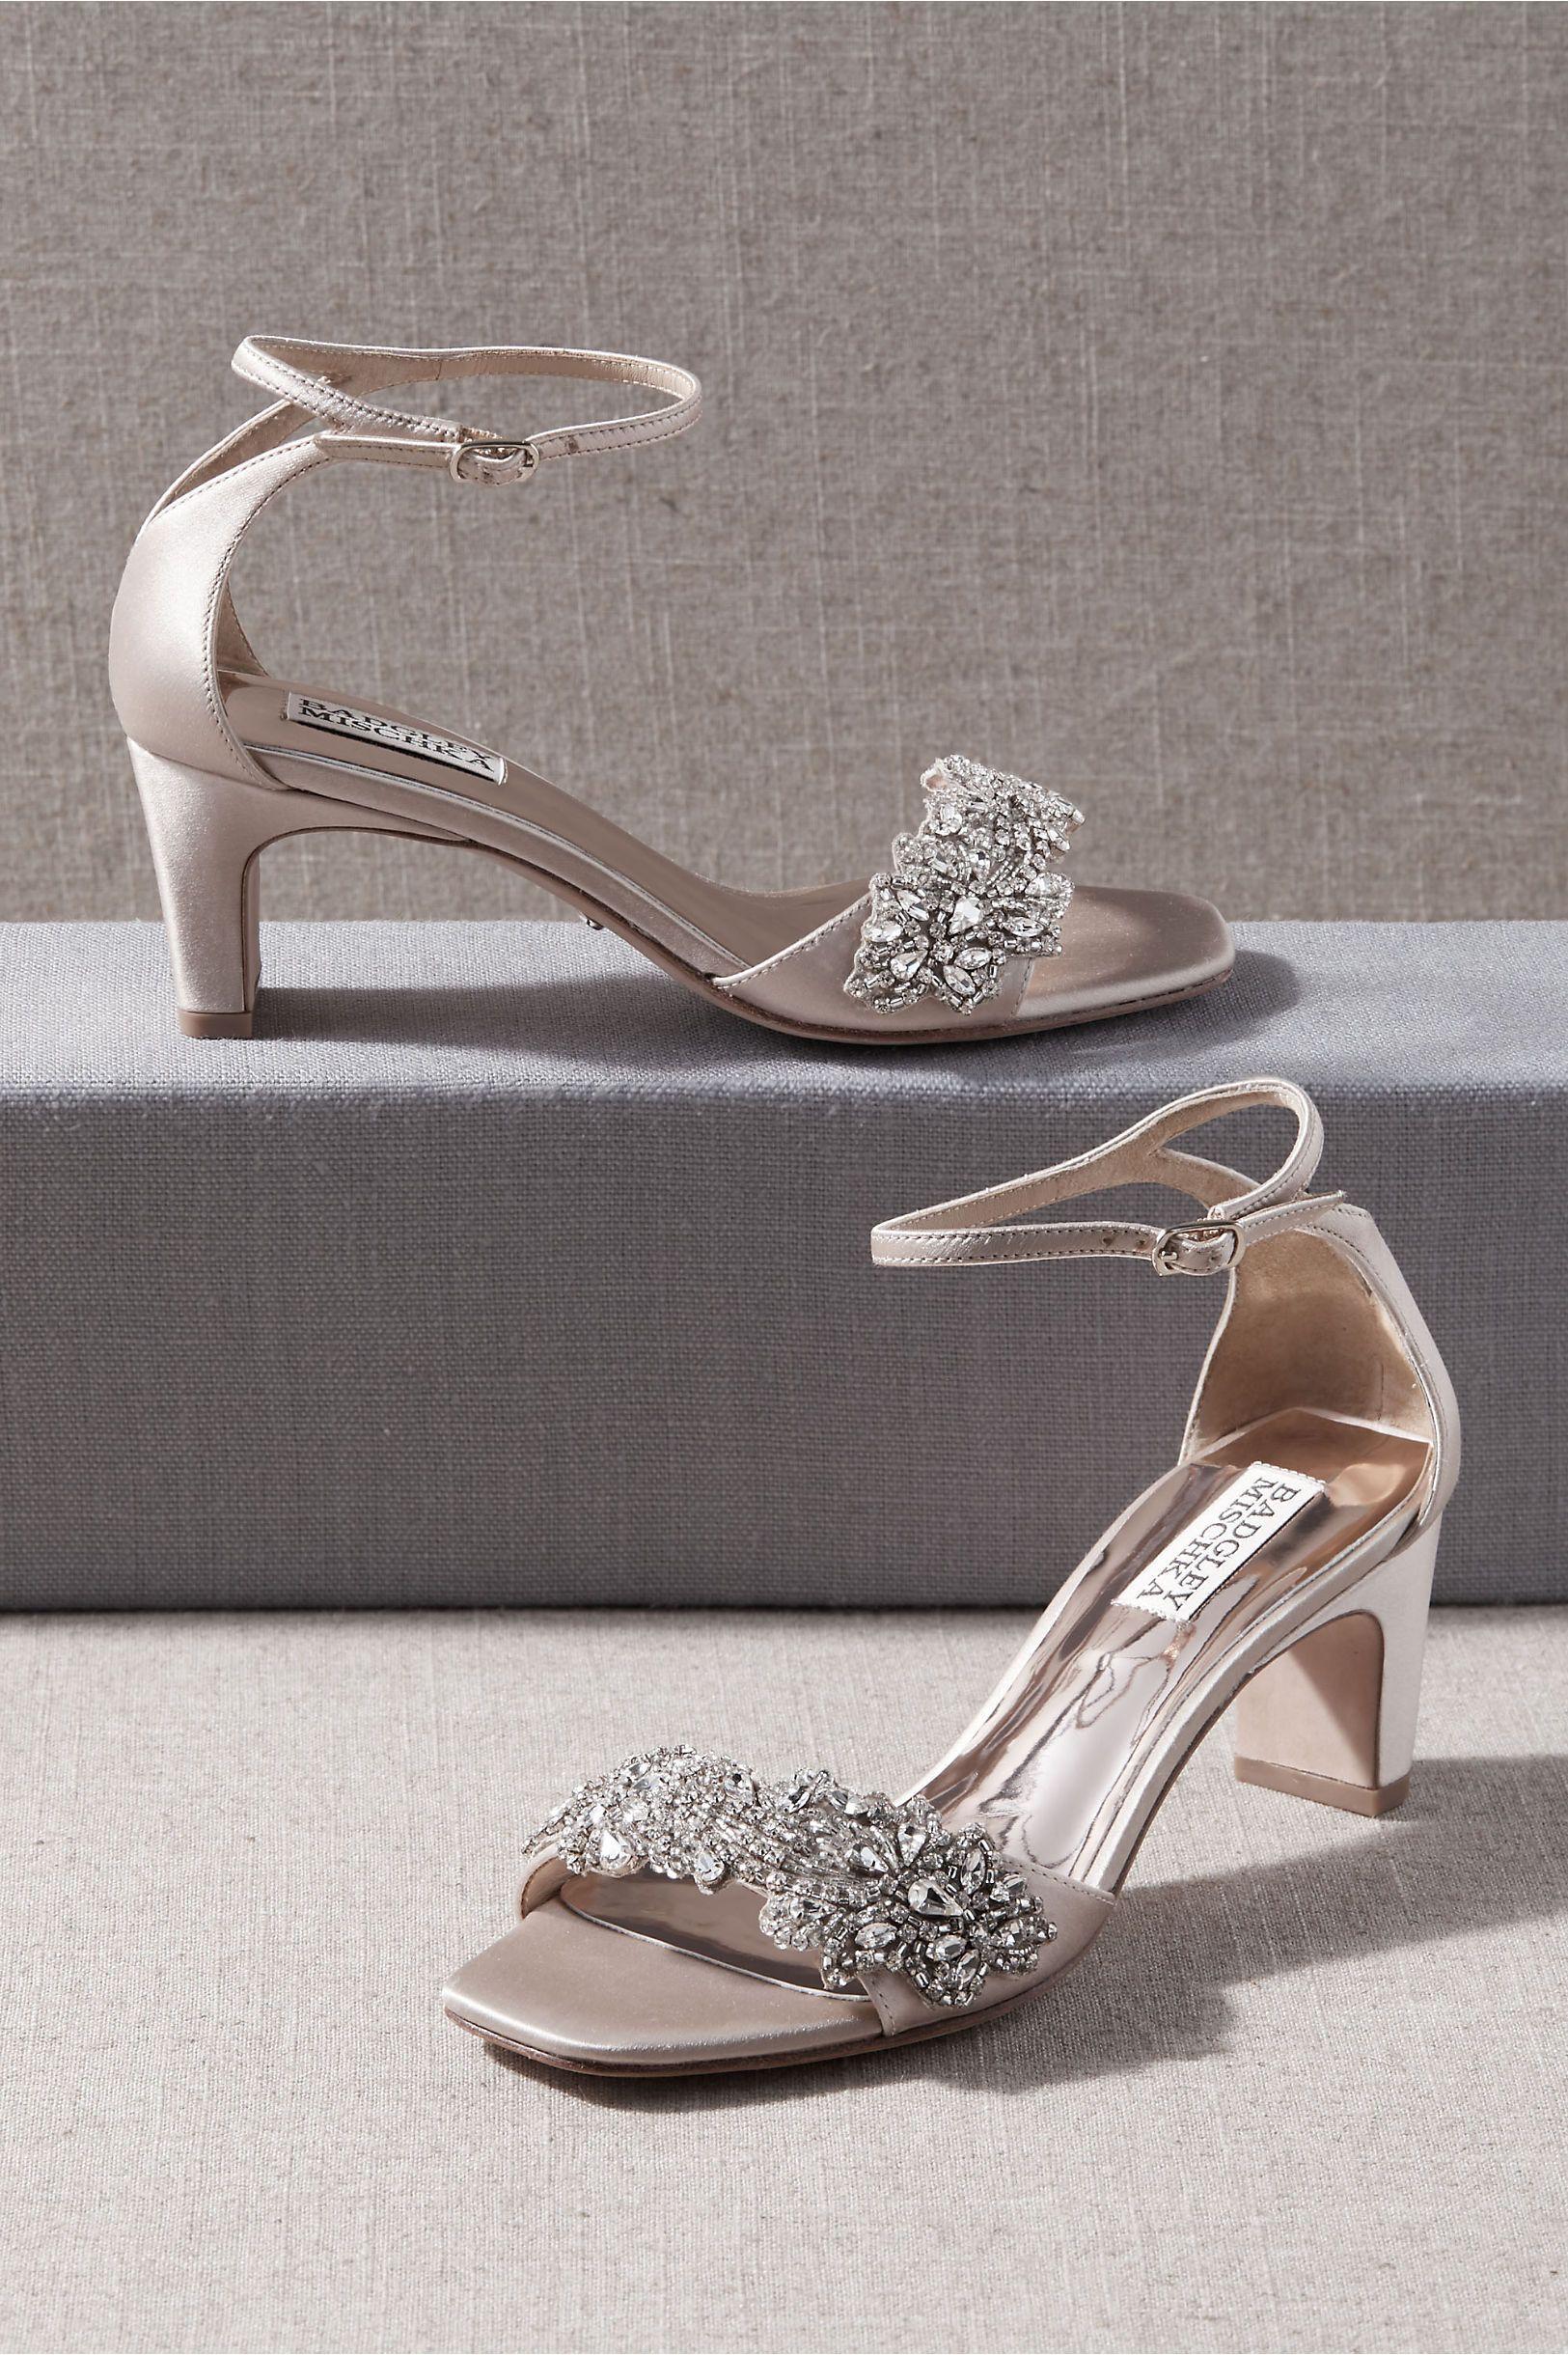 Badgley Mischka Alison Heels Bridal Shoes Wedding Shoes Low Heel Wedding Shoes